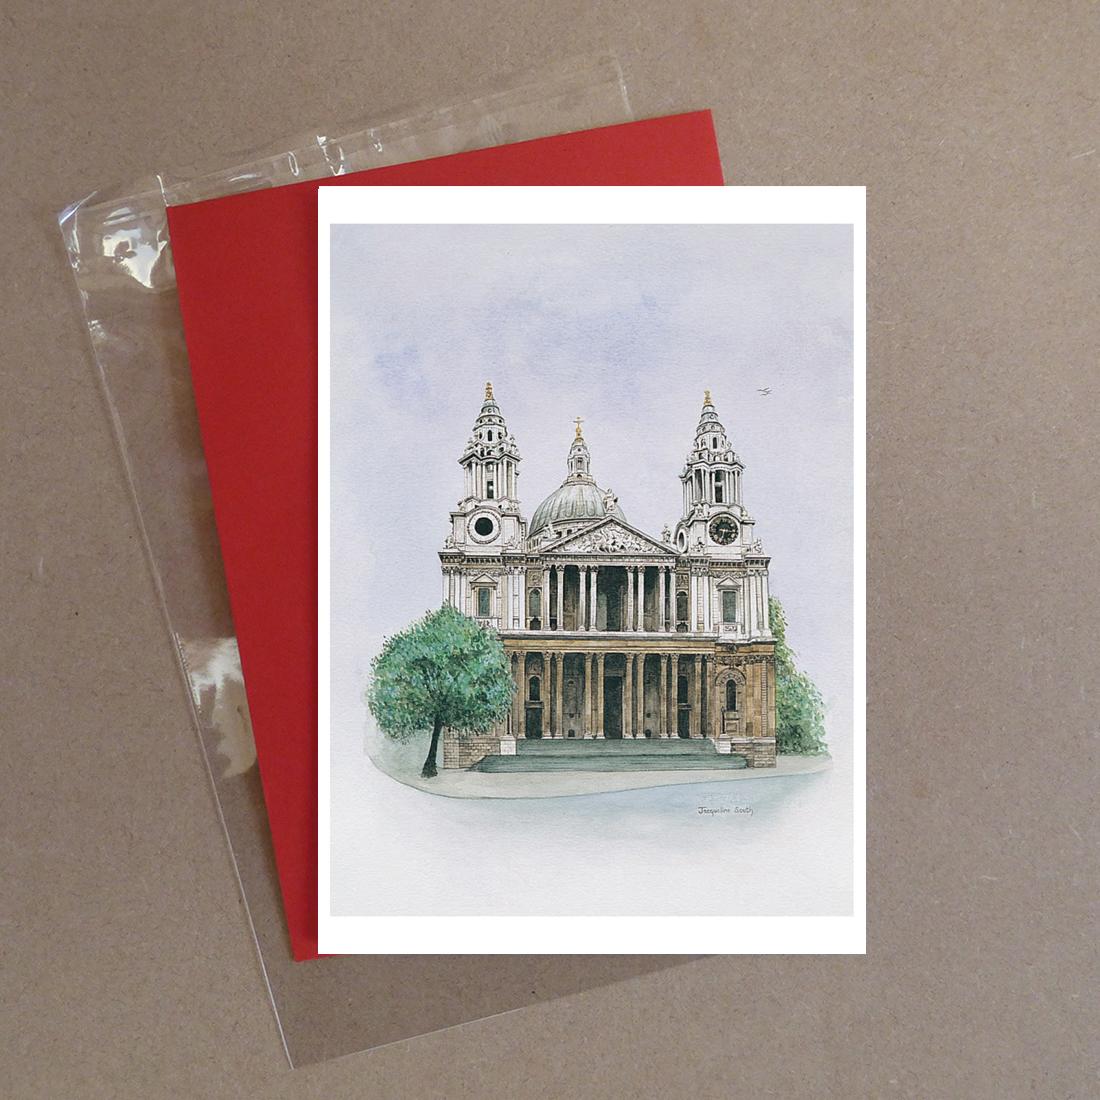 St. Pauls Cathedral, London Greeting Card